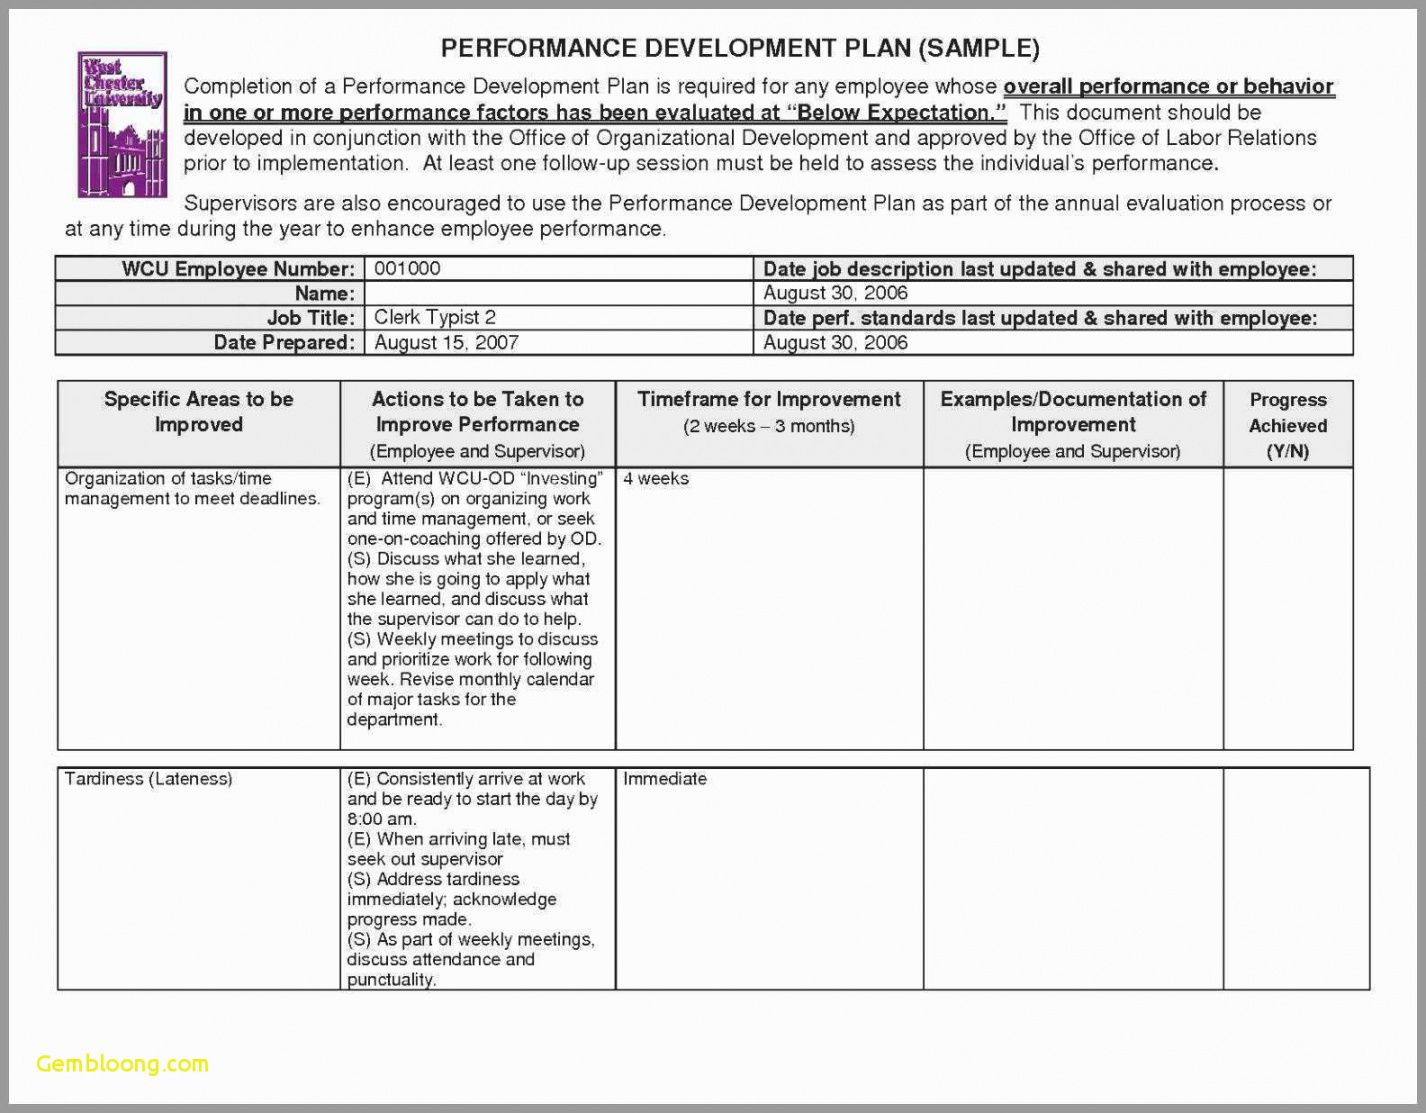 printable checklist template samples due diligence vendor report high quality vendor checklist template examples